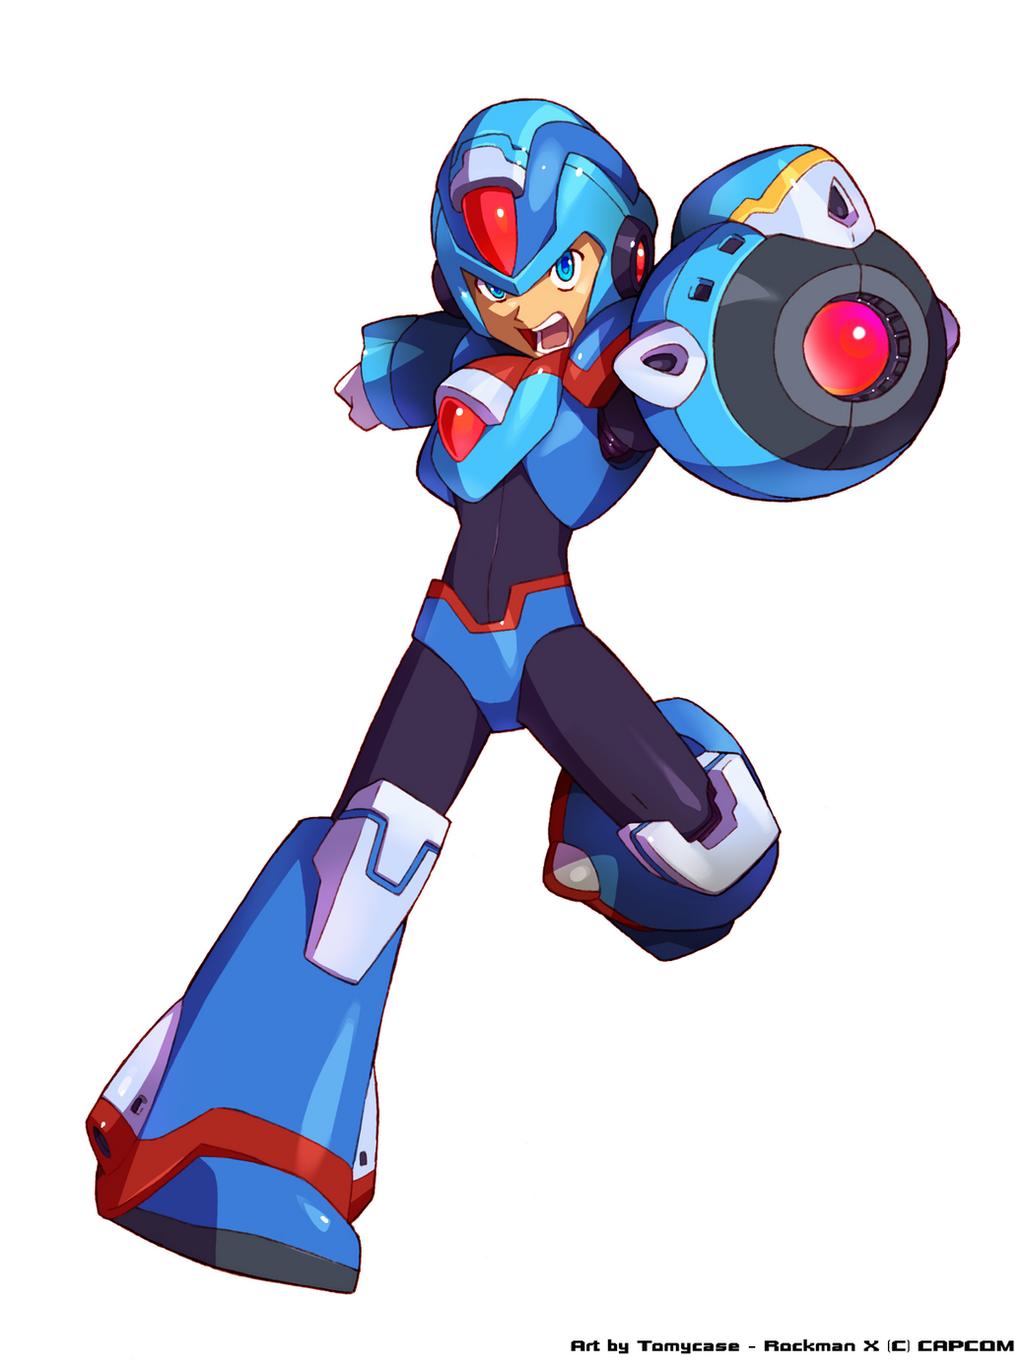 Megaman x revamp hunter x by tomycase on deviantart for Mission exe